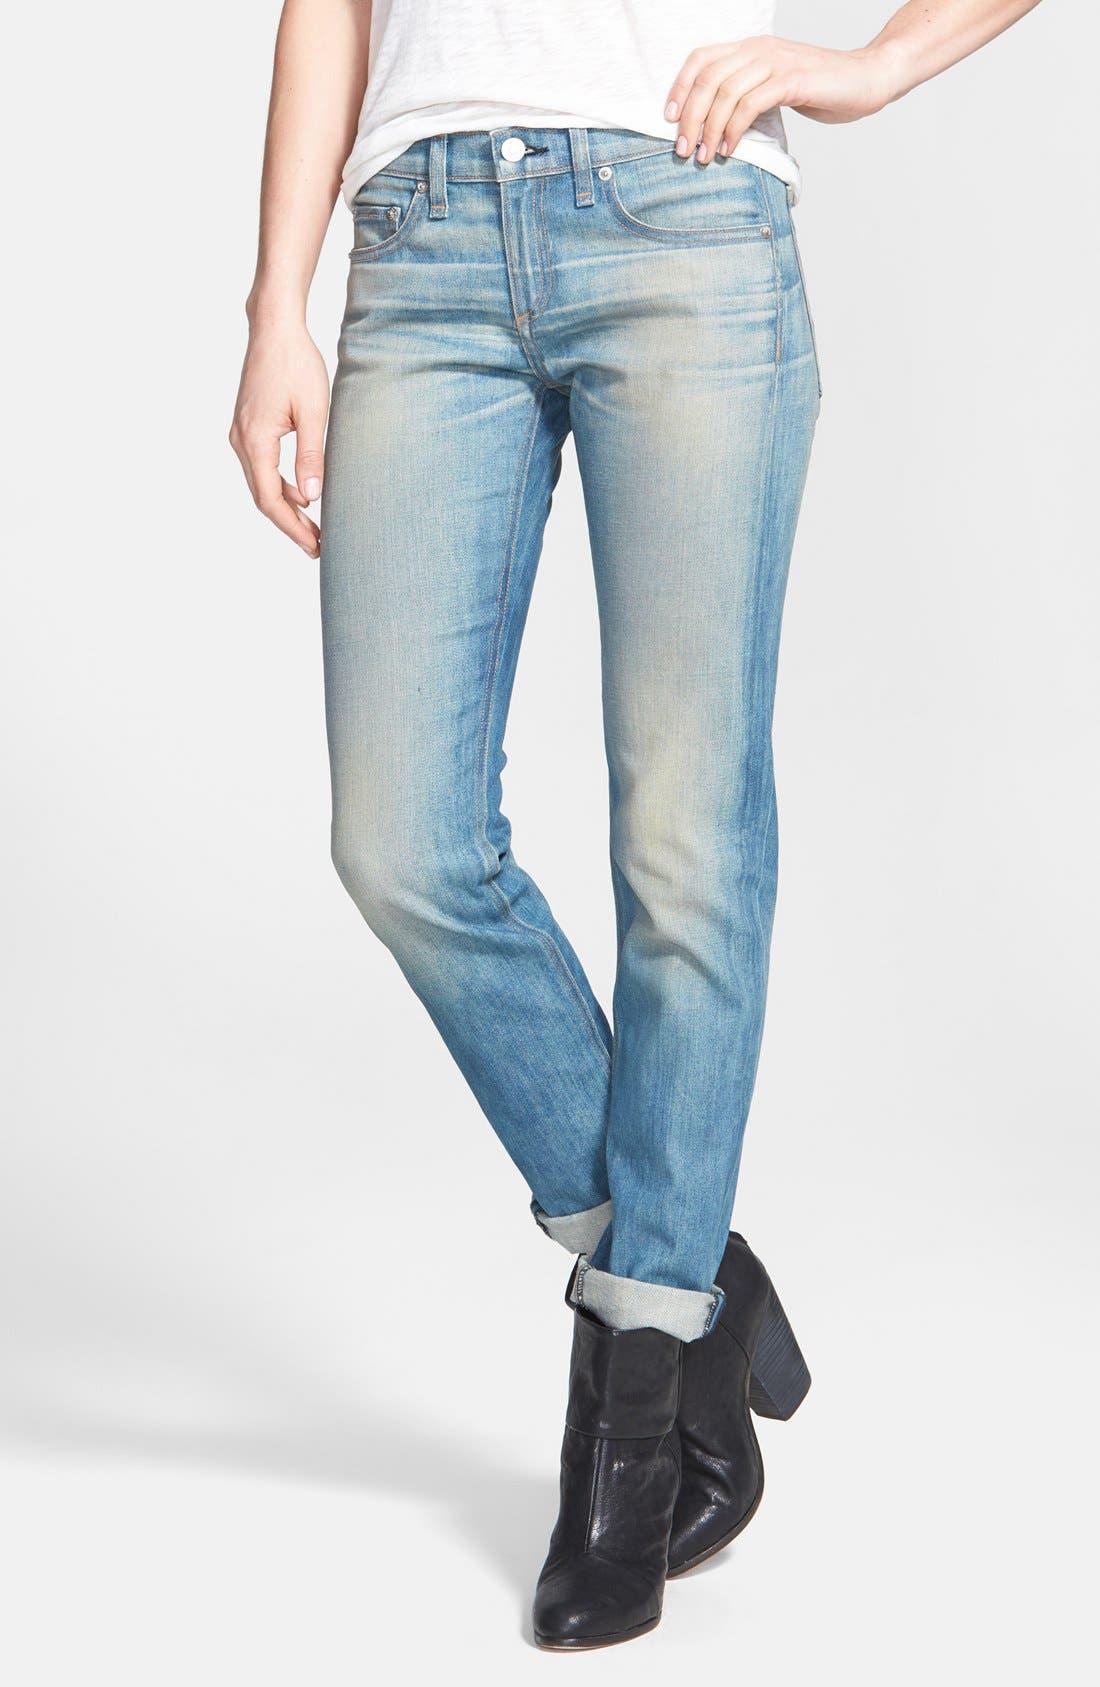 Alternate Image 1 Selected - rag & bone/JEAN 'The Dre' Slim Fit Boyfriend Jeans (Greencast)